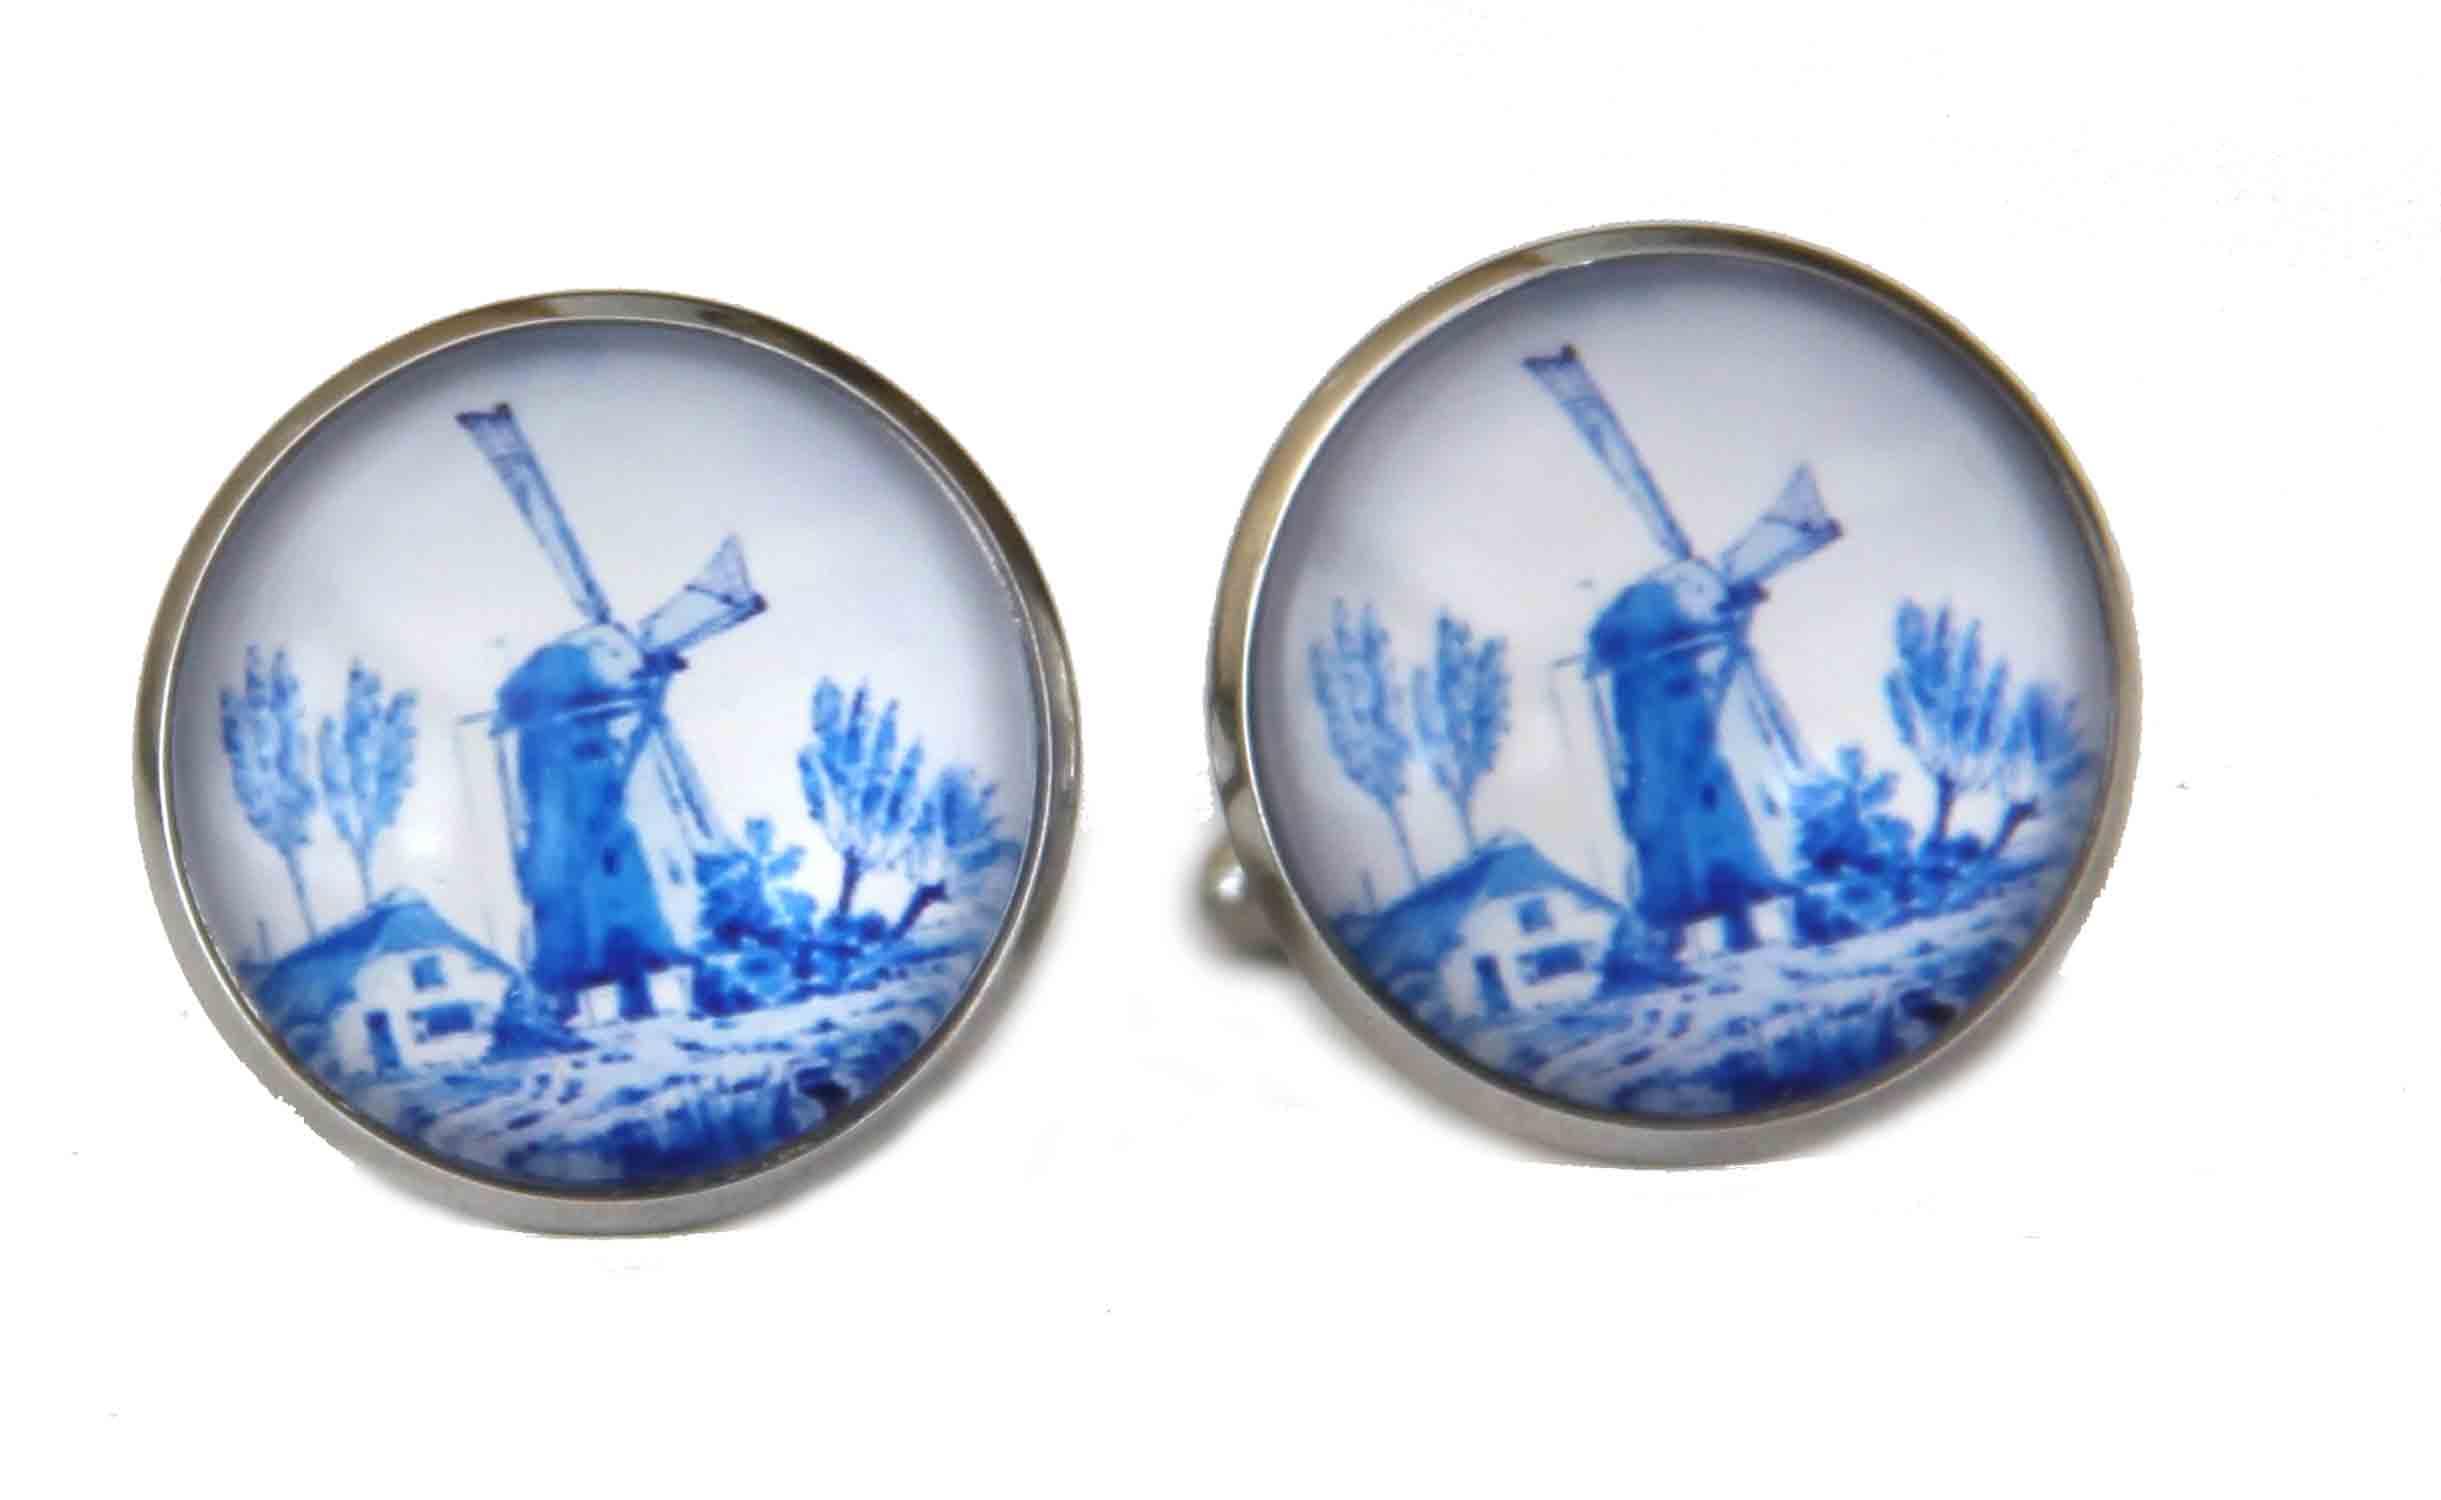 Gascoigne Cufflinks Handmade Delft Pattern Windmill Blue White Silver Men's